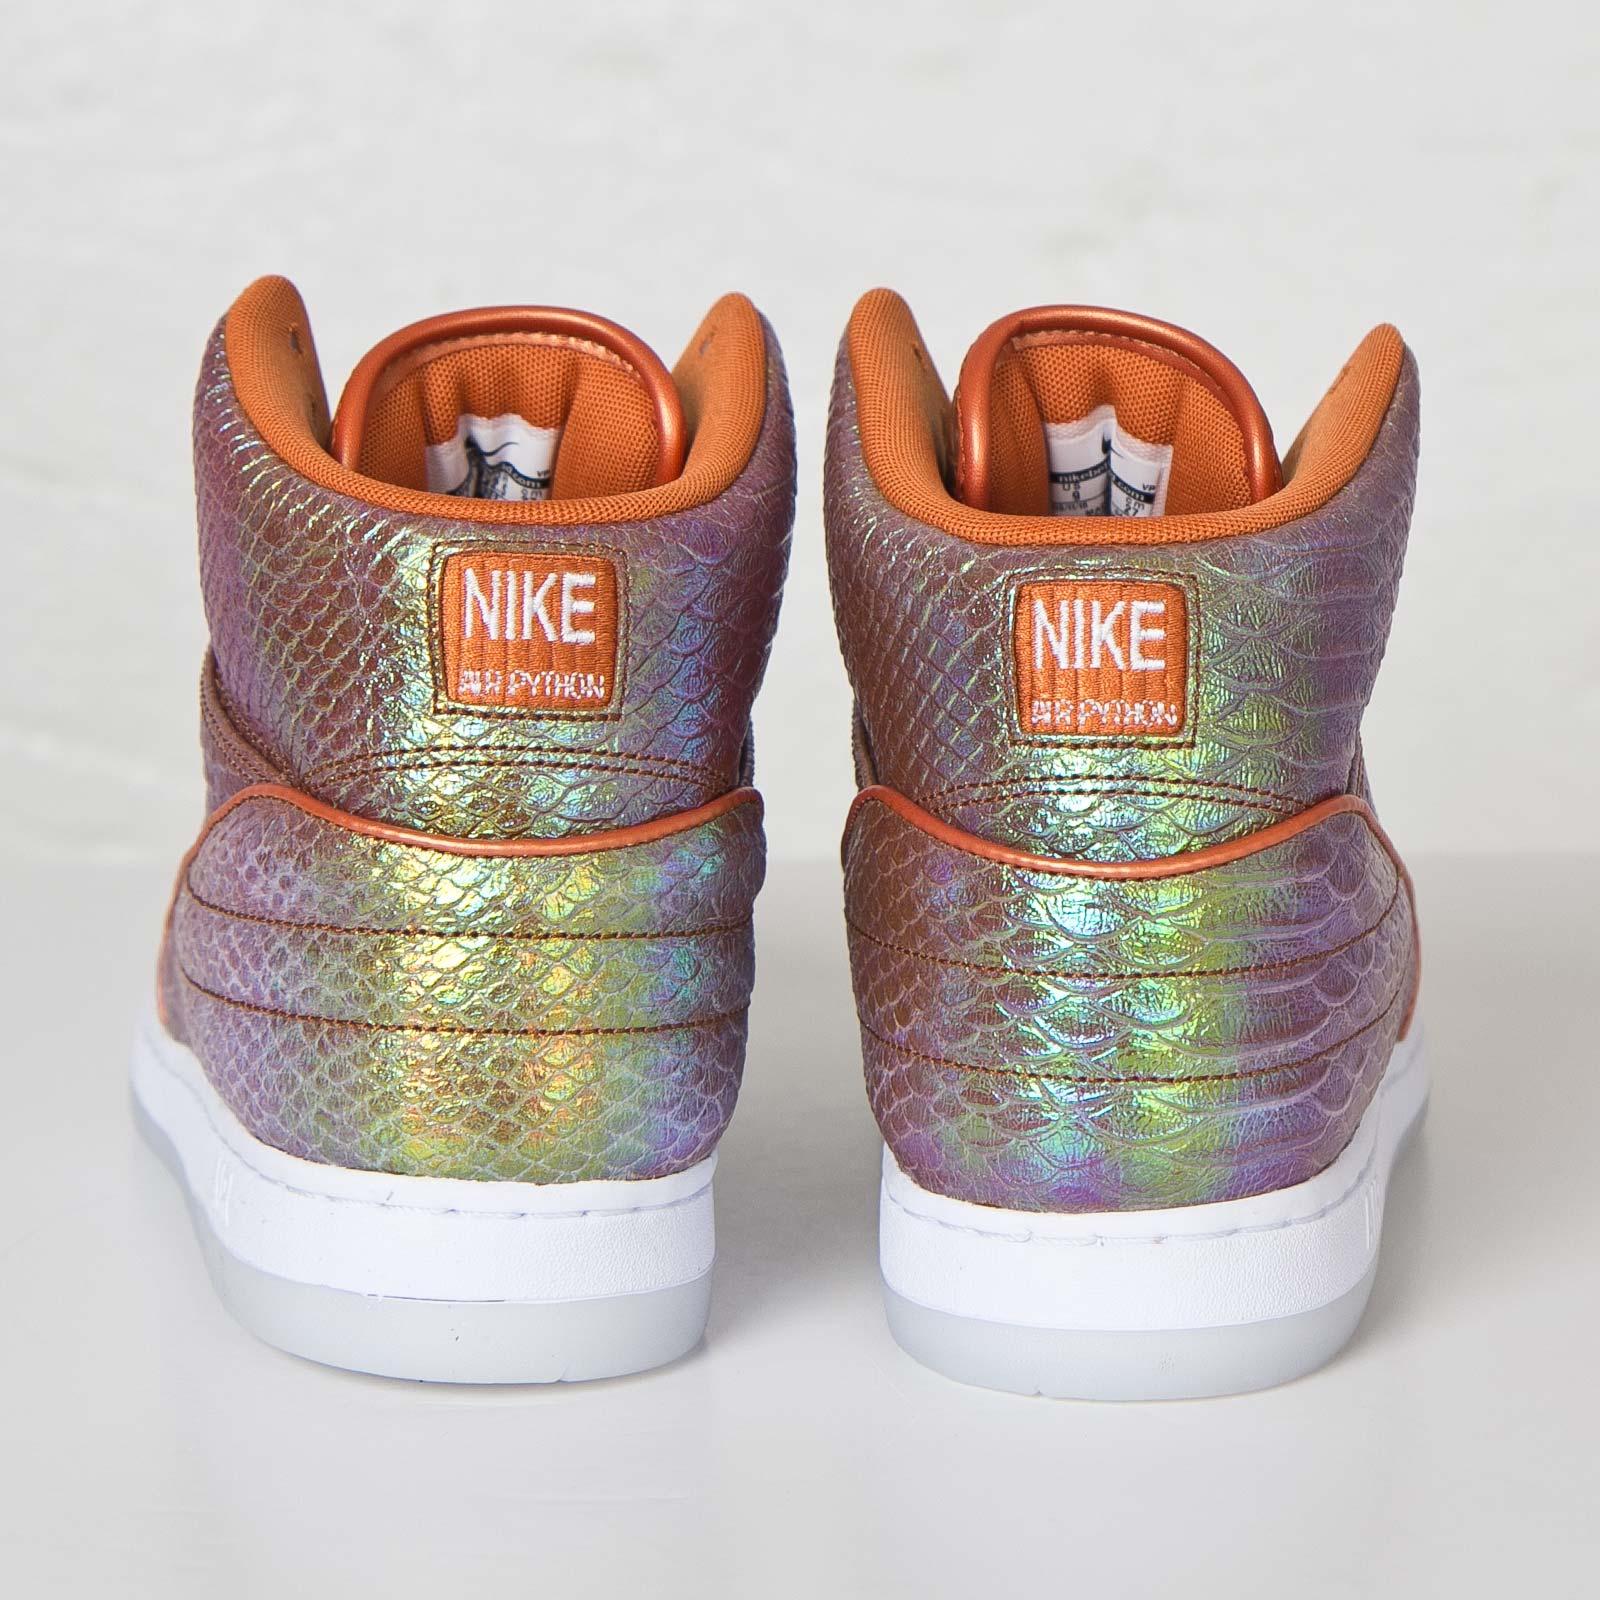 online store 55517 b4c5e Nike Air Python Premium - 705066-202 - Sneakersnstuff   sneakers    streetwear online since 1999